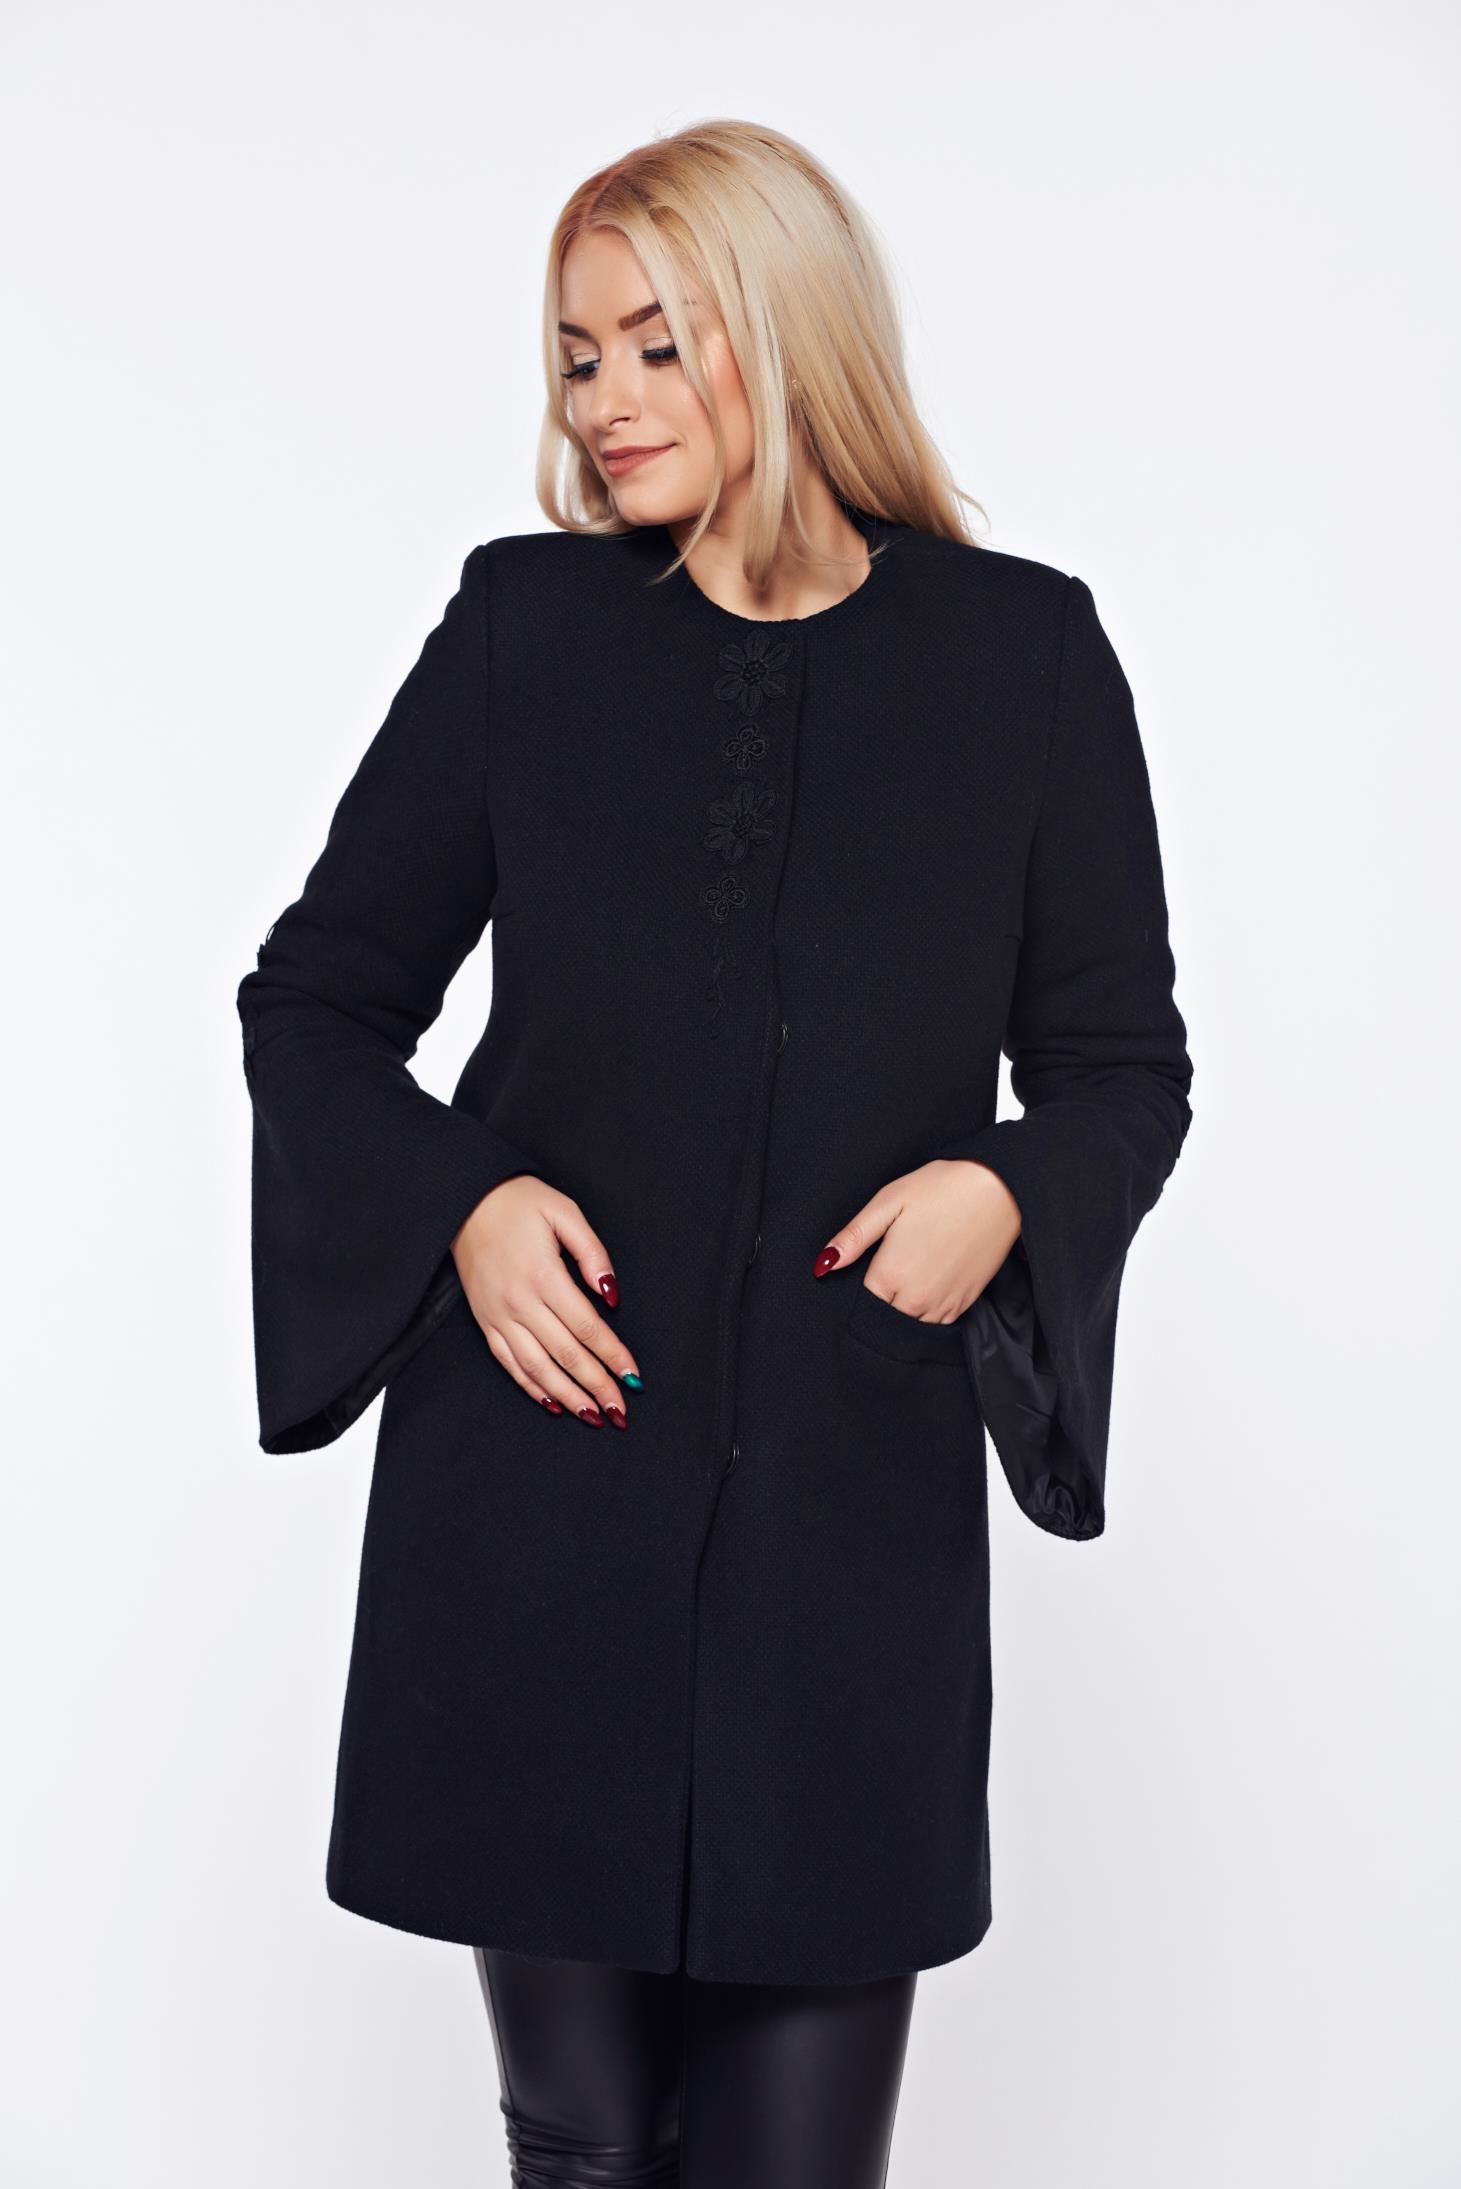 Palton LaDonna negru elegant drept brodat din lana